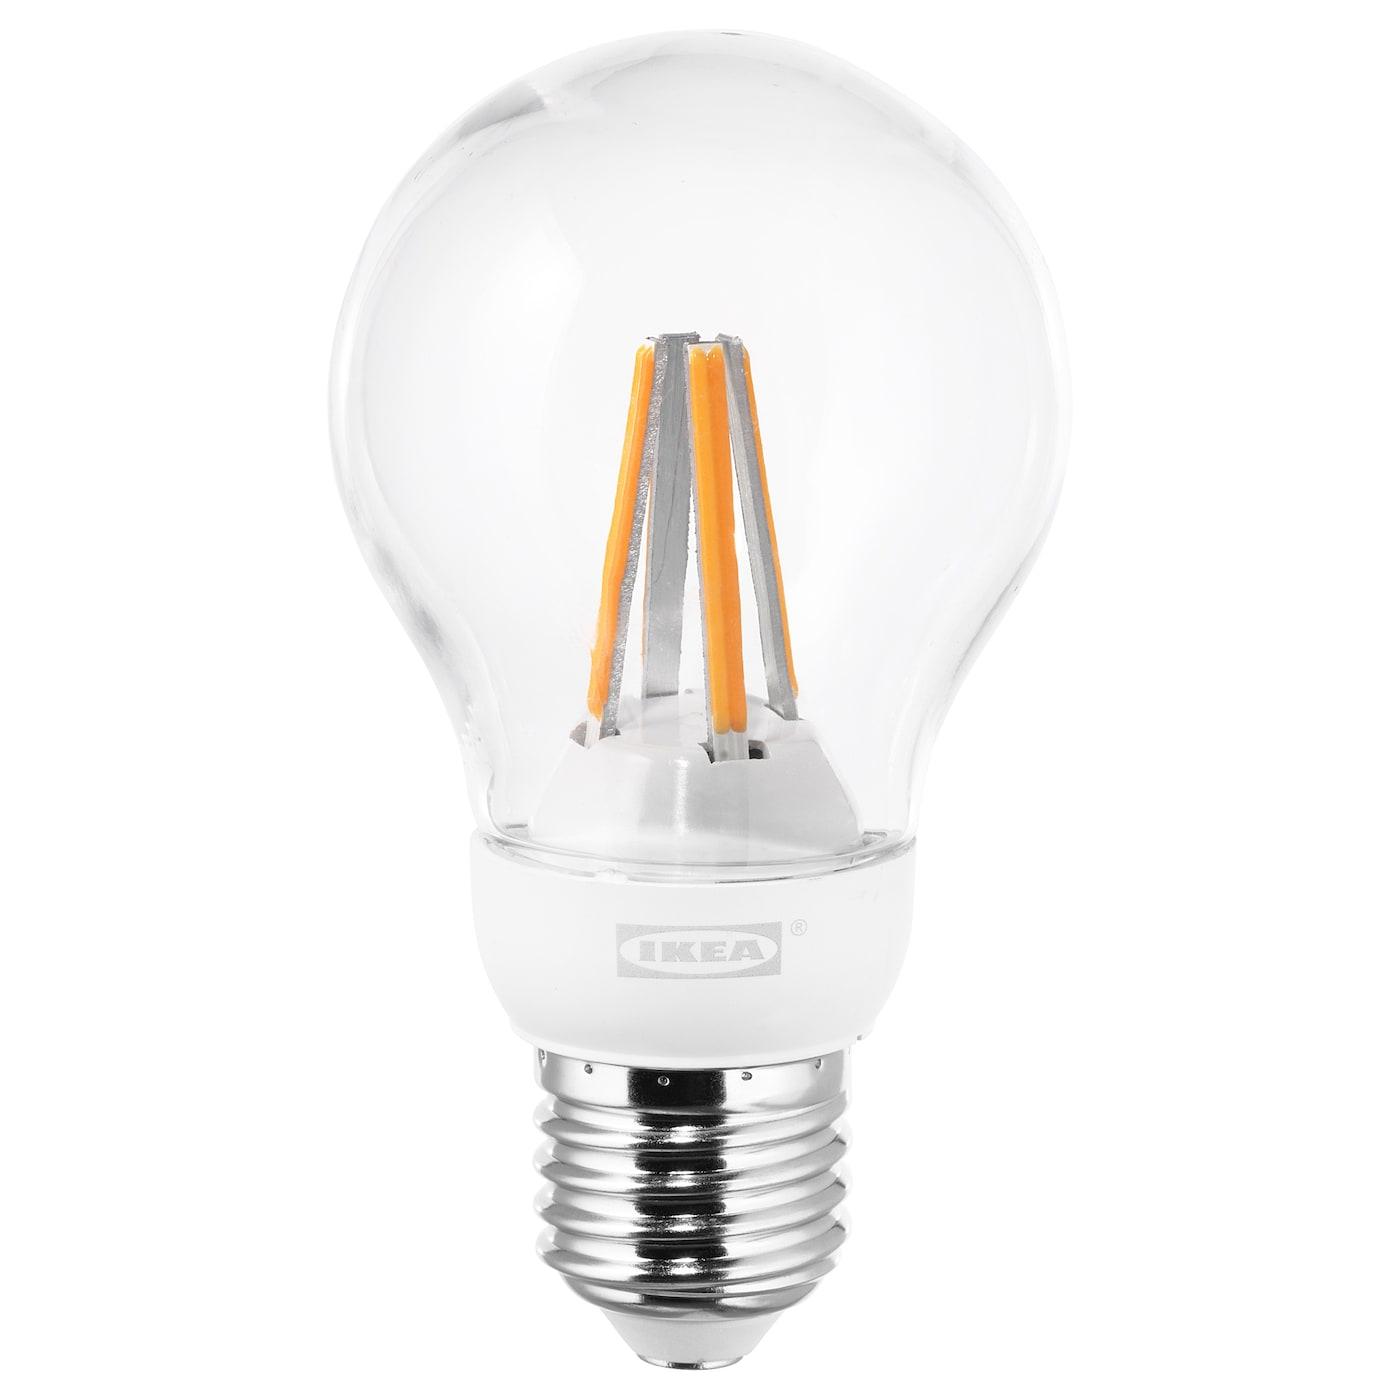 ledare led bulb e27 600 lumen warm dimming globe clear ikea. Black Bedroom Furniture Sets. Home Design Ideas